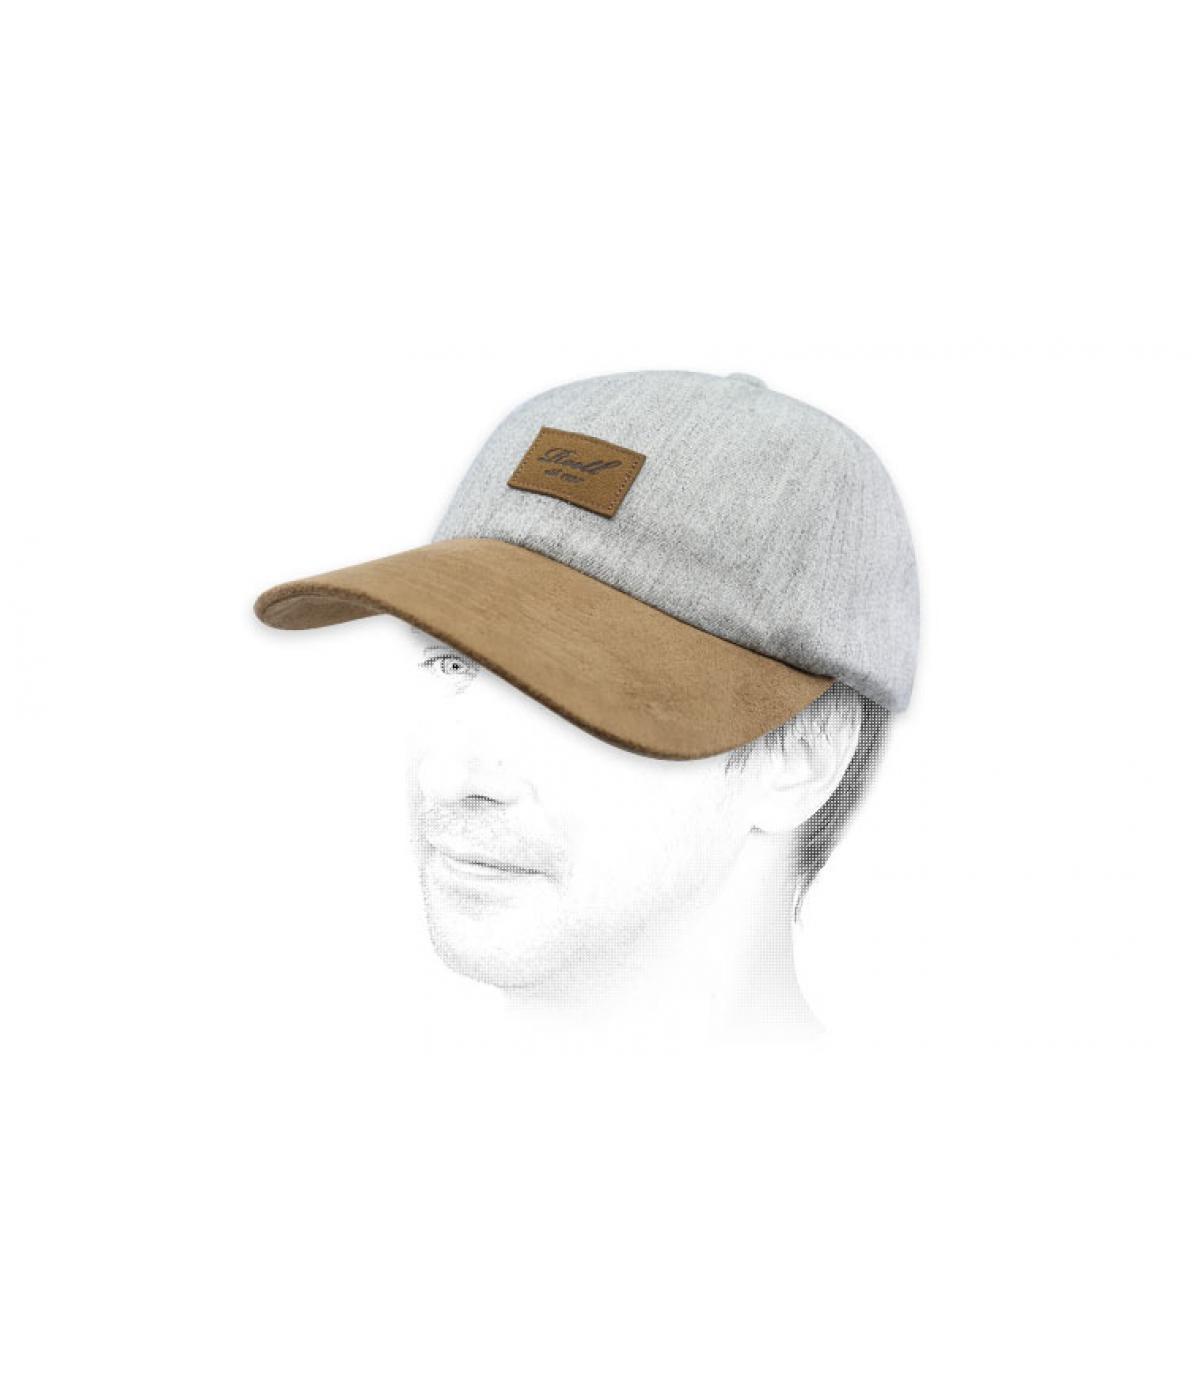 gorra gris Reell parche